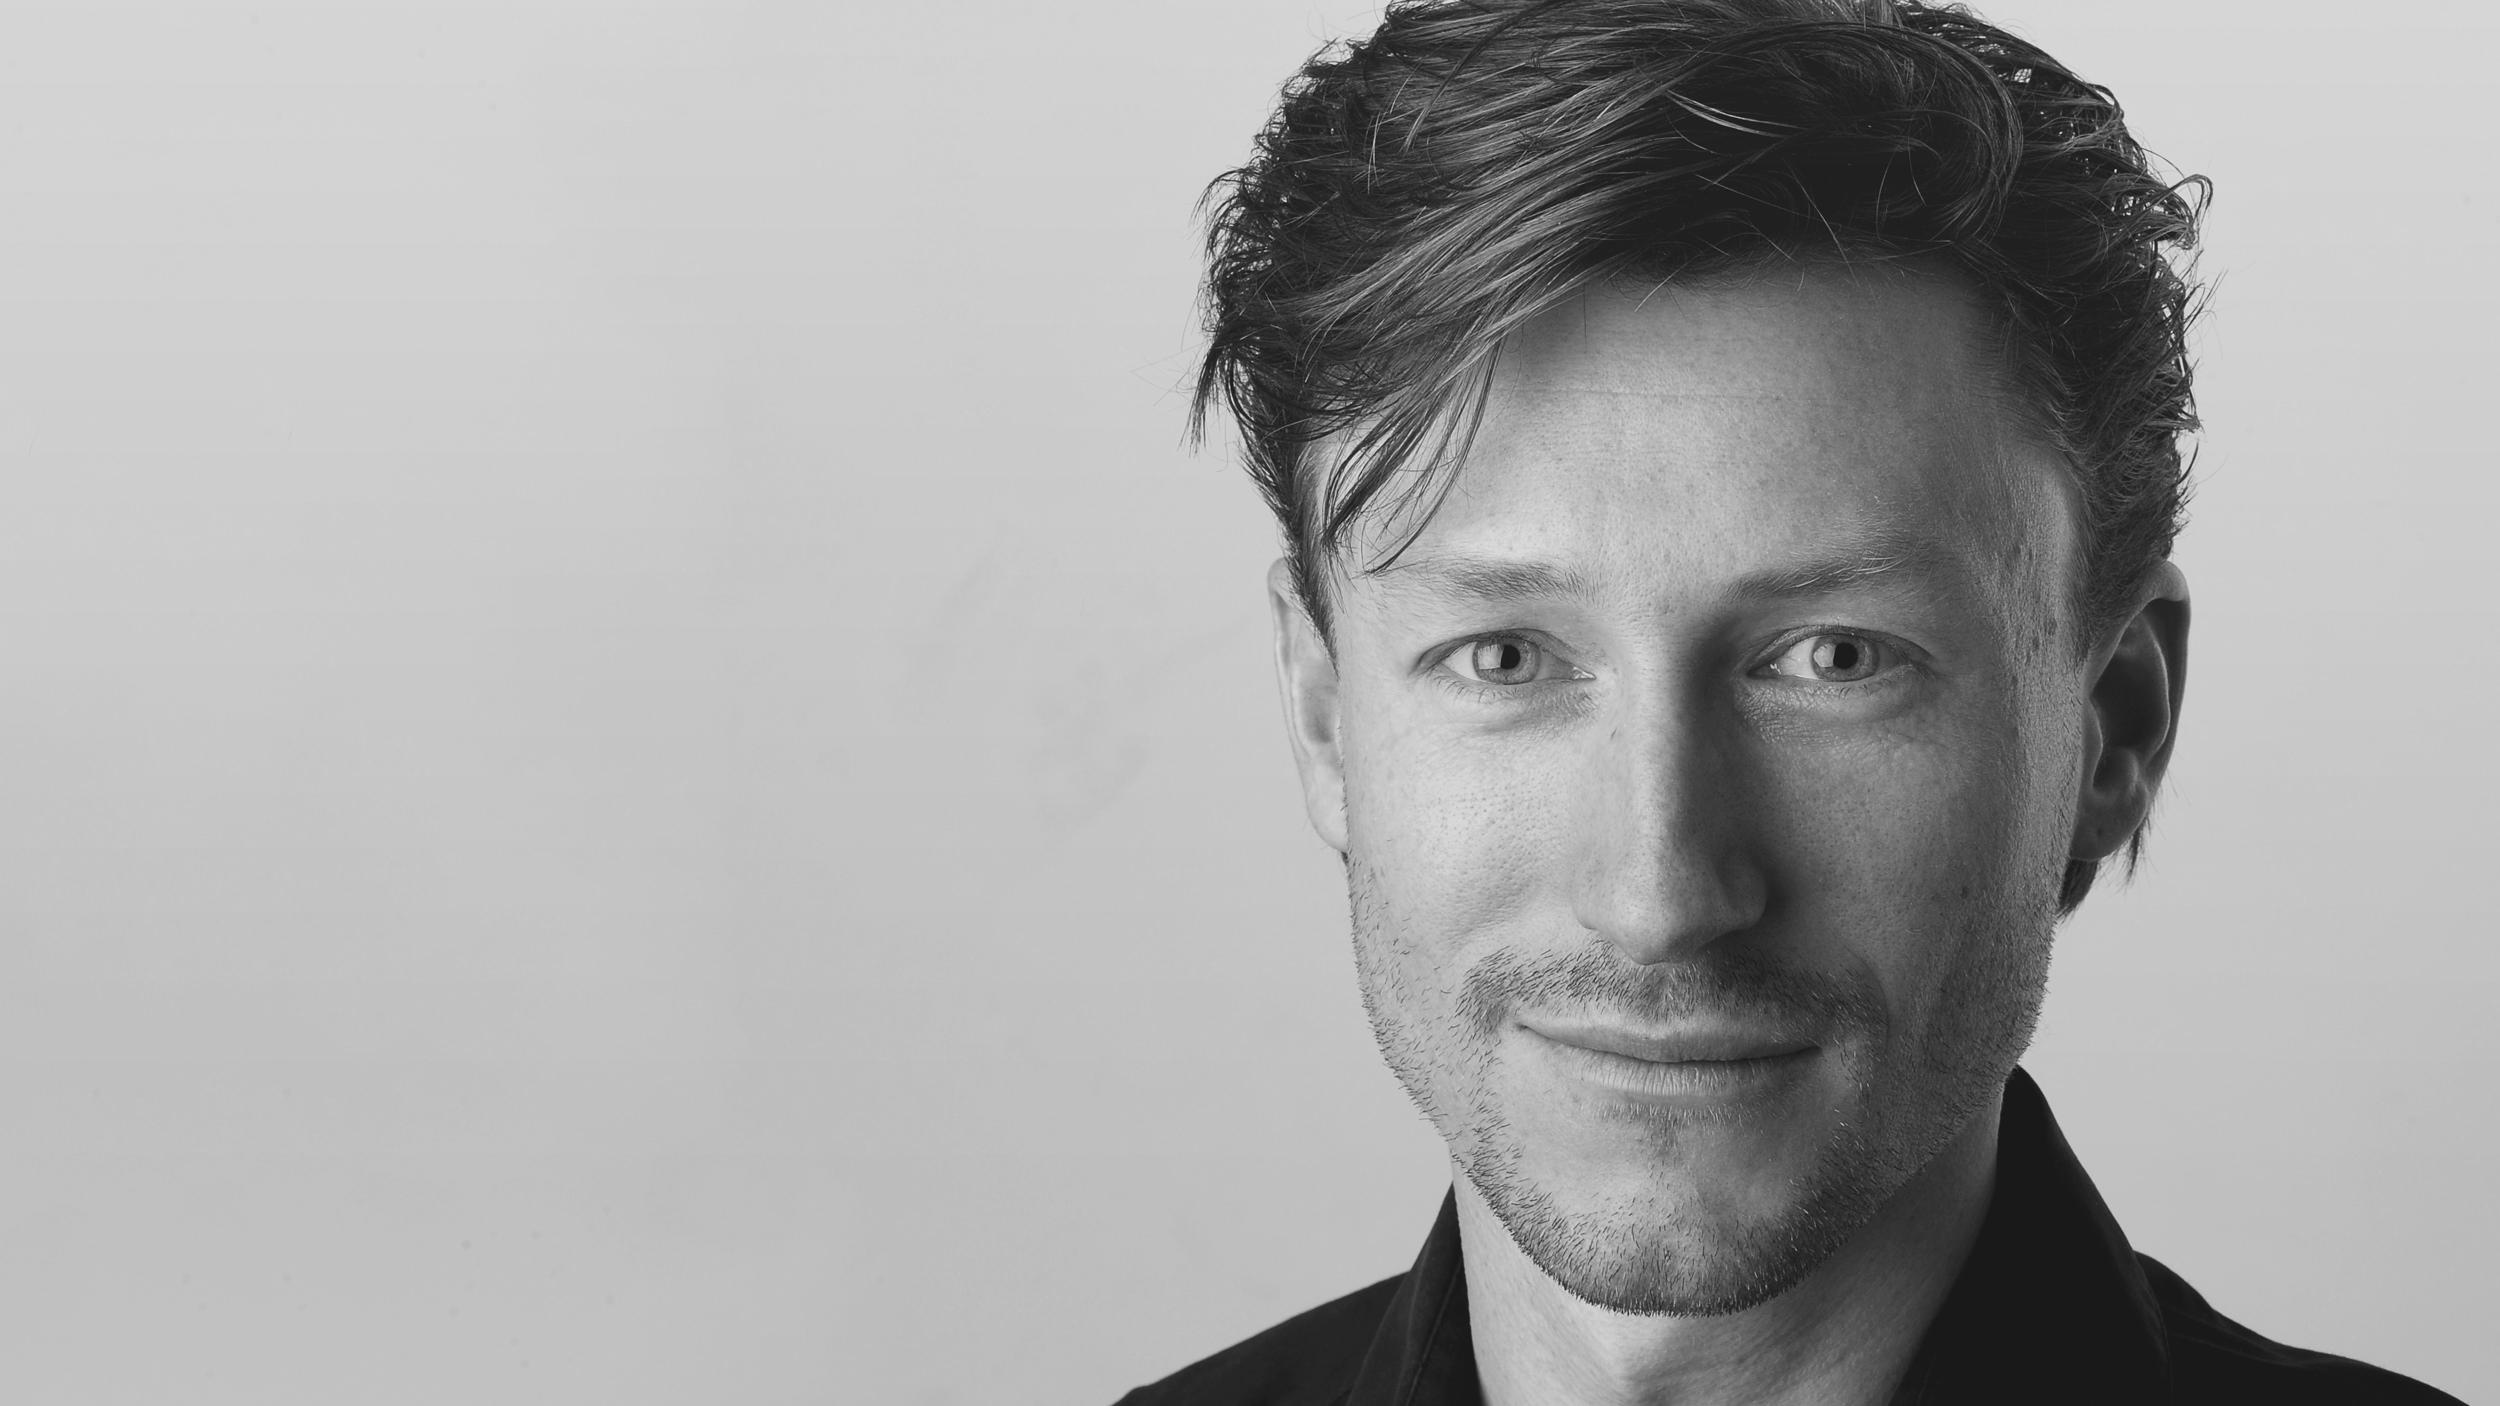 Florian Zellweger  / Fondateur d'Influenz  Crédits: Laeticia Perles